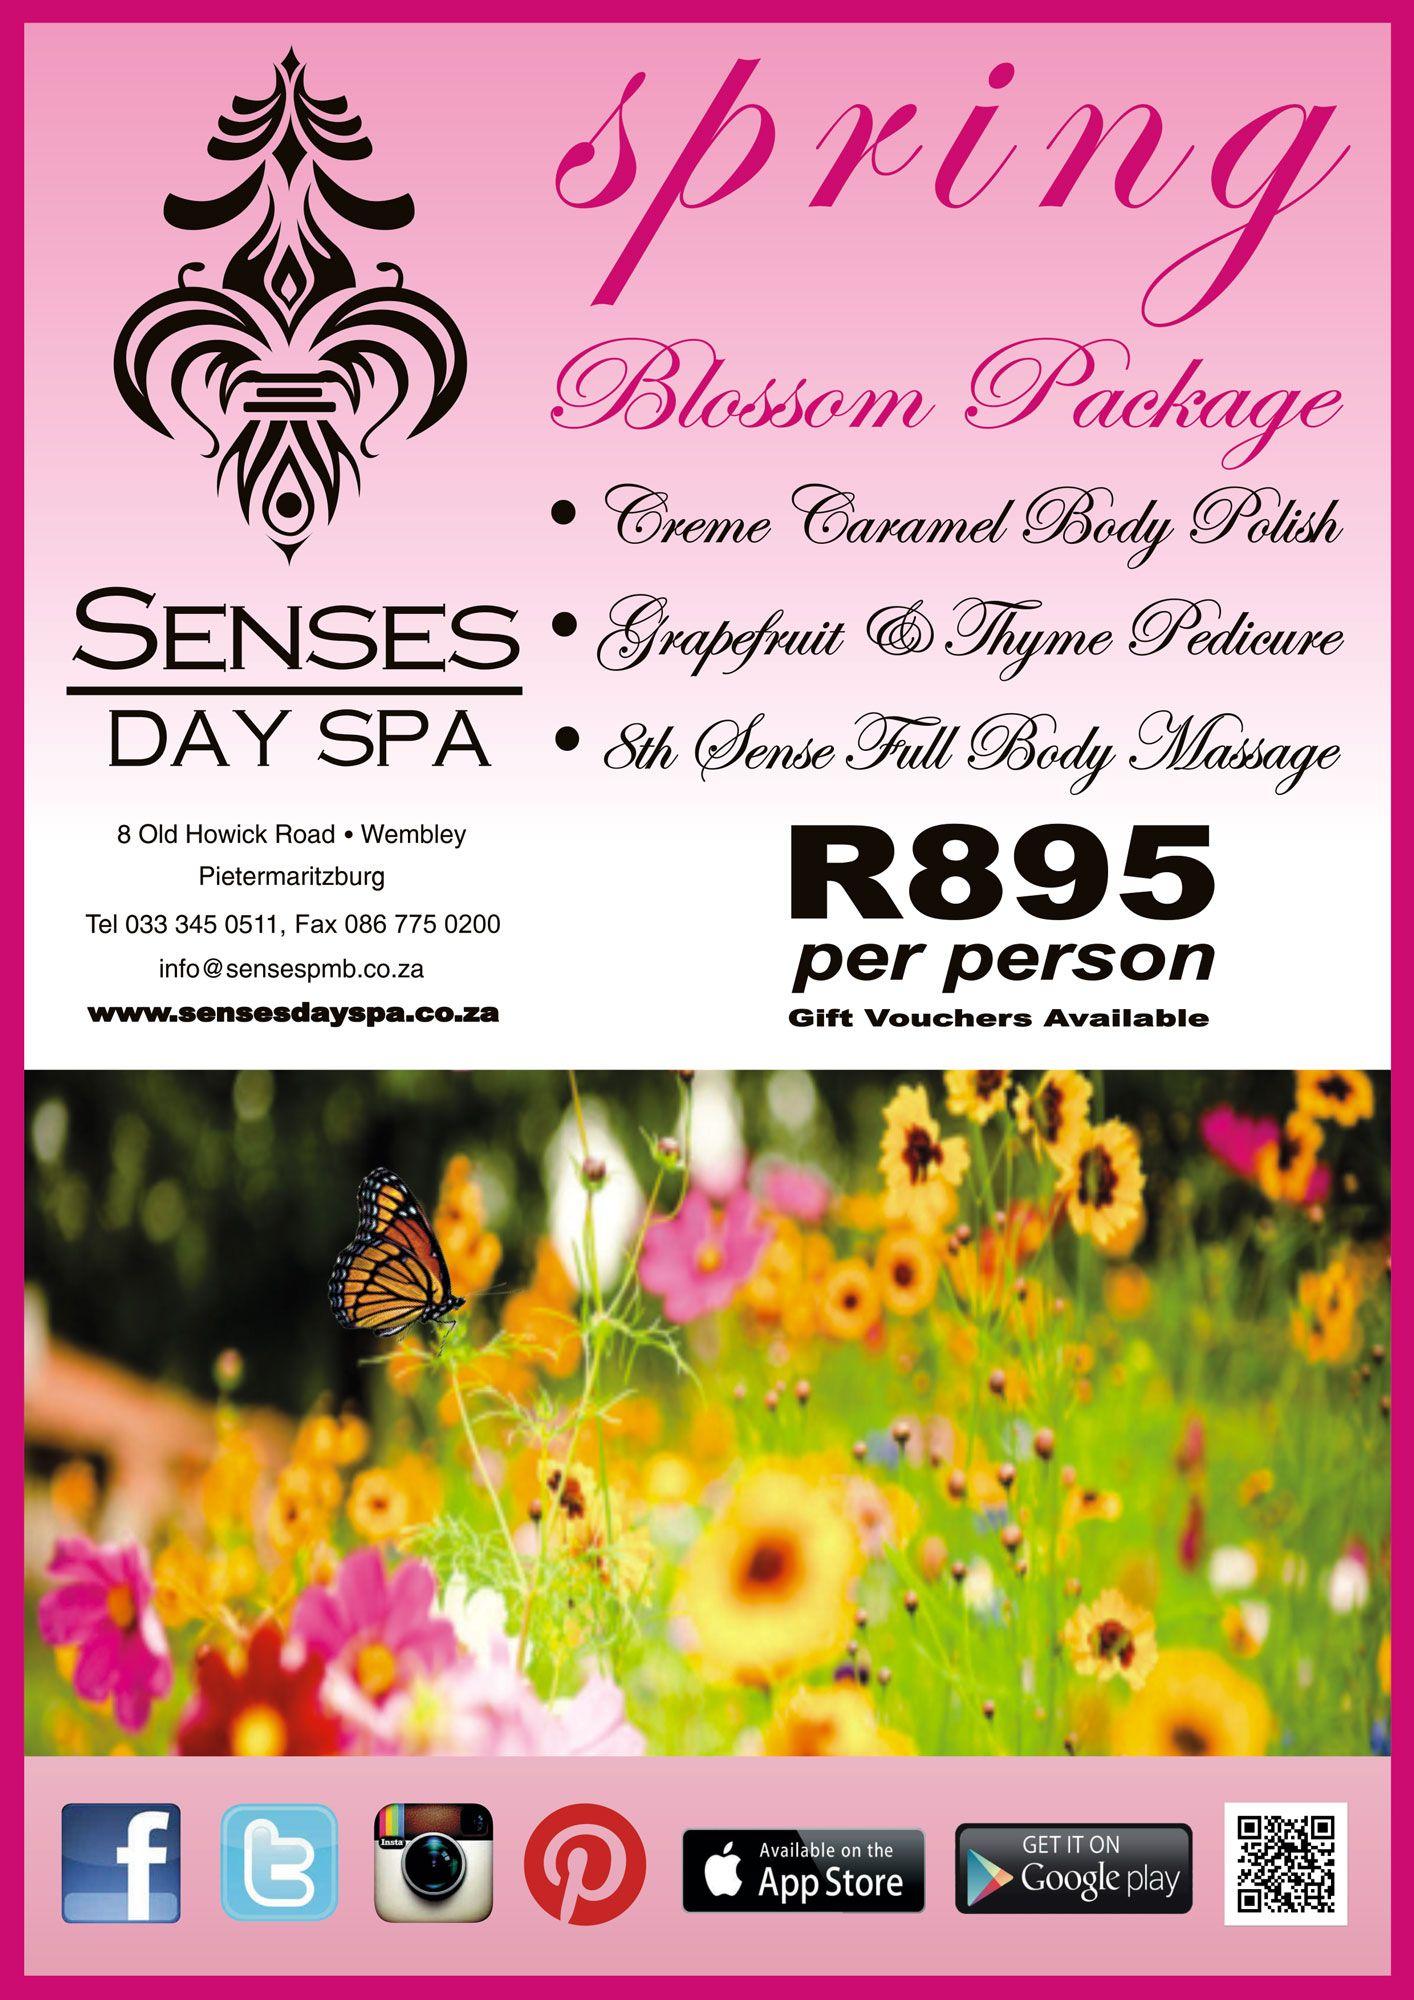 Senses Day Spa In Pietermaritzburg